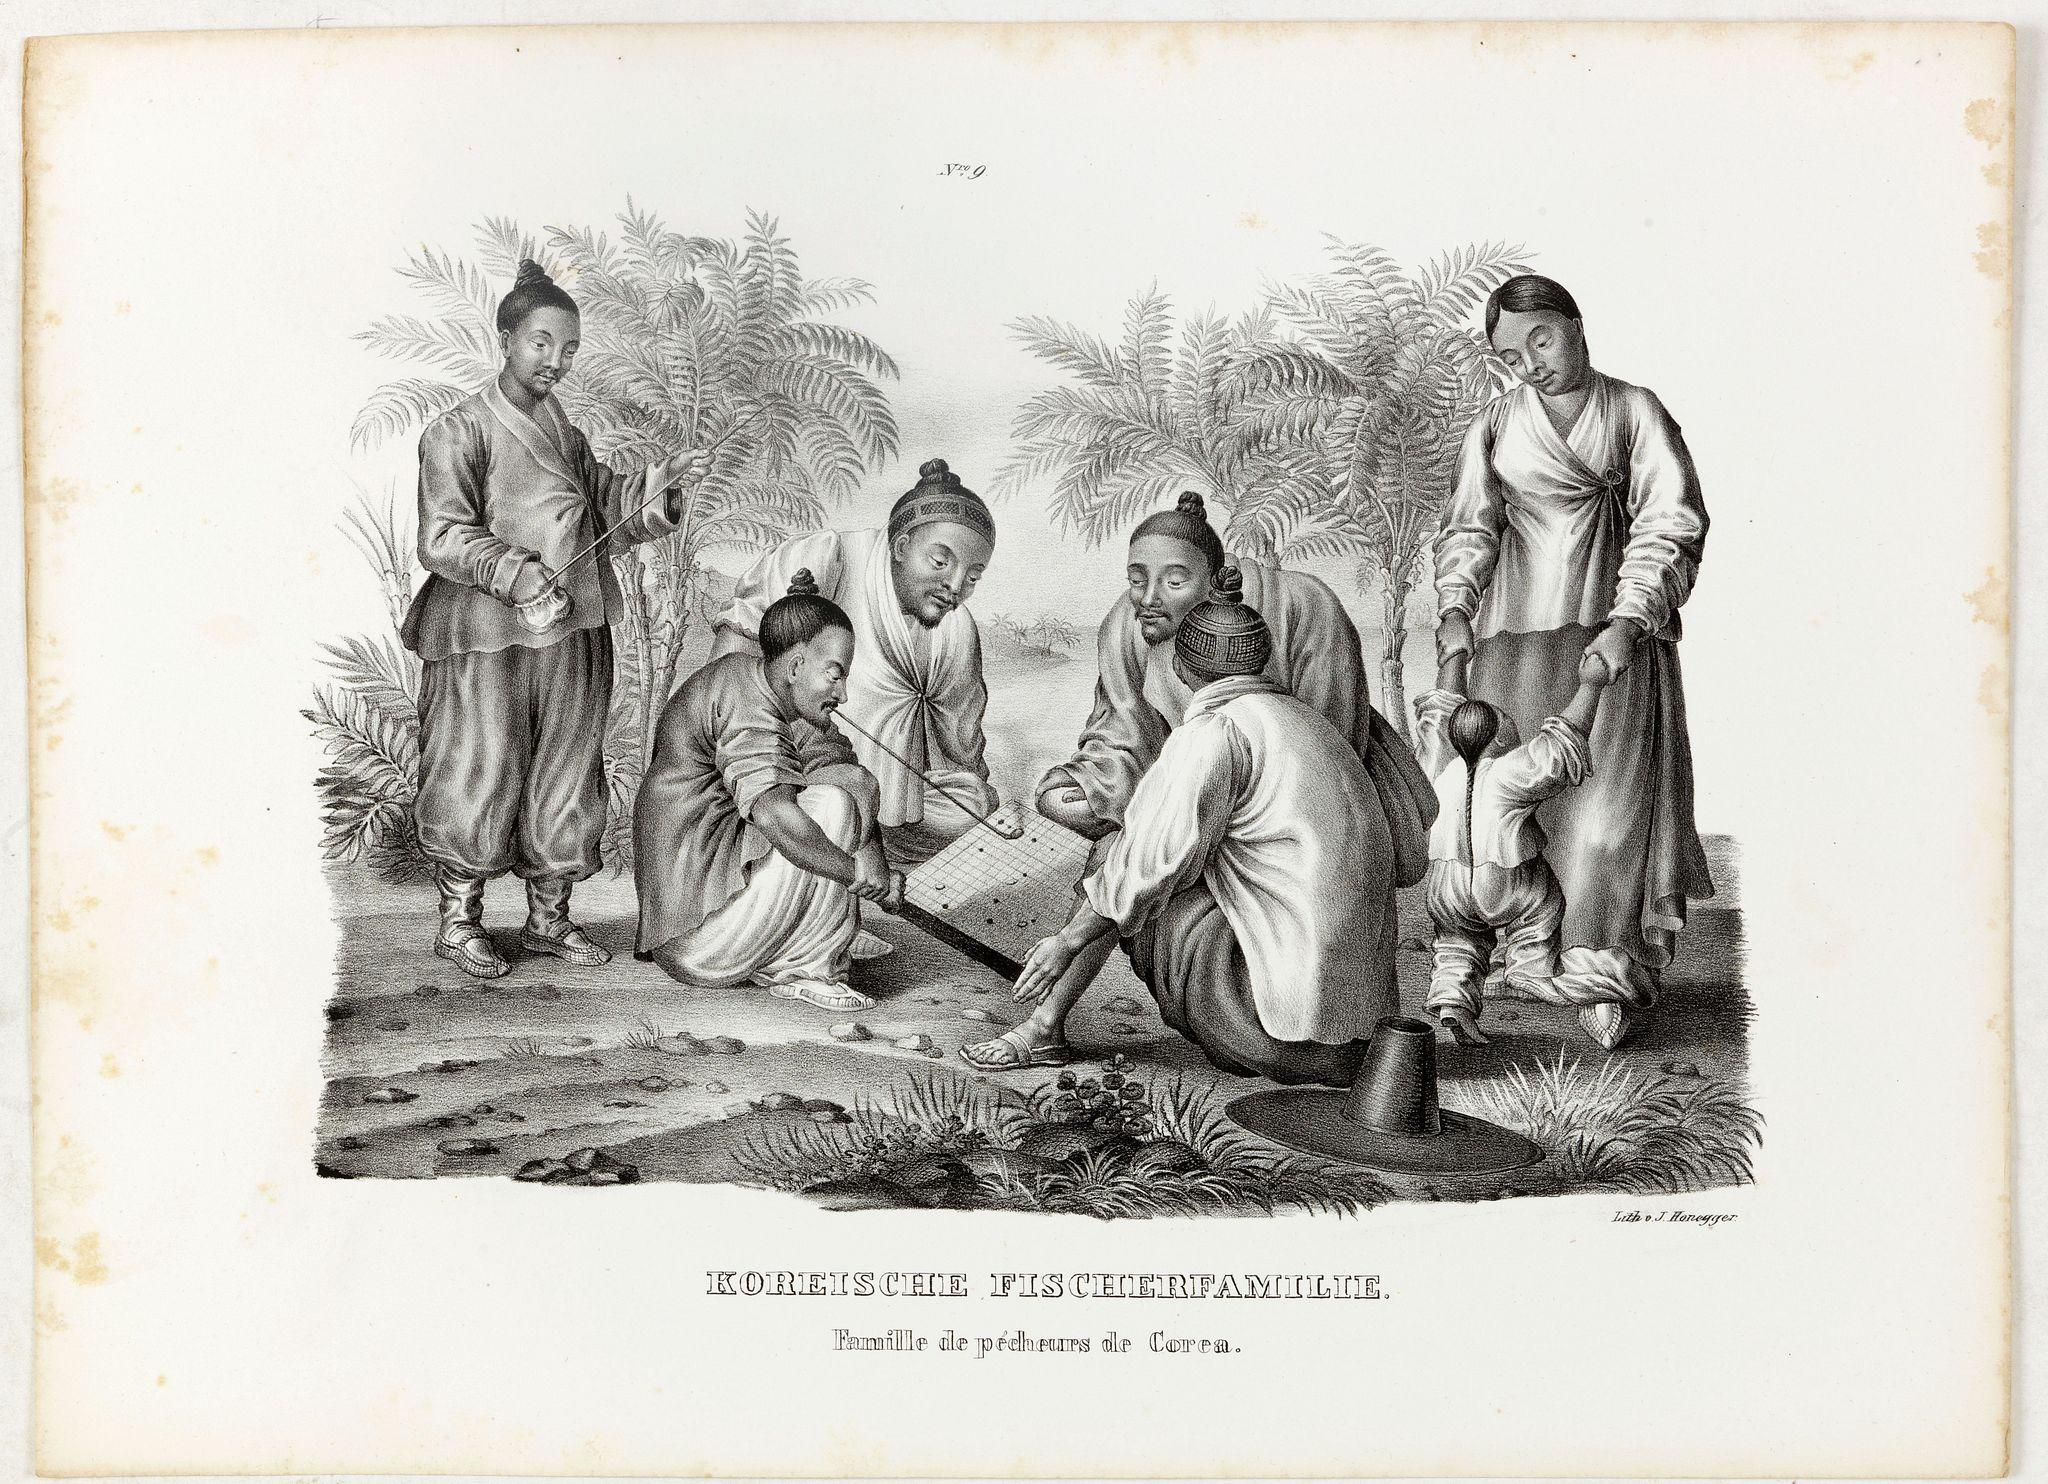 HONEGGER, V. -  Koreische Fischerfamilie. Famille de pecheurs de Corea.